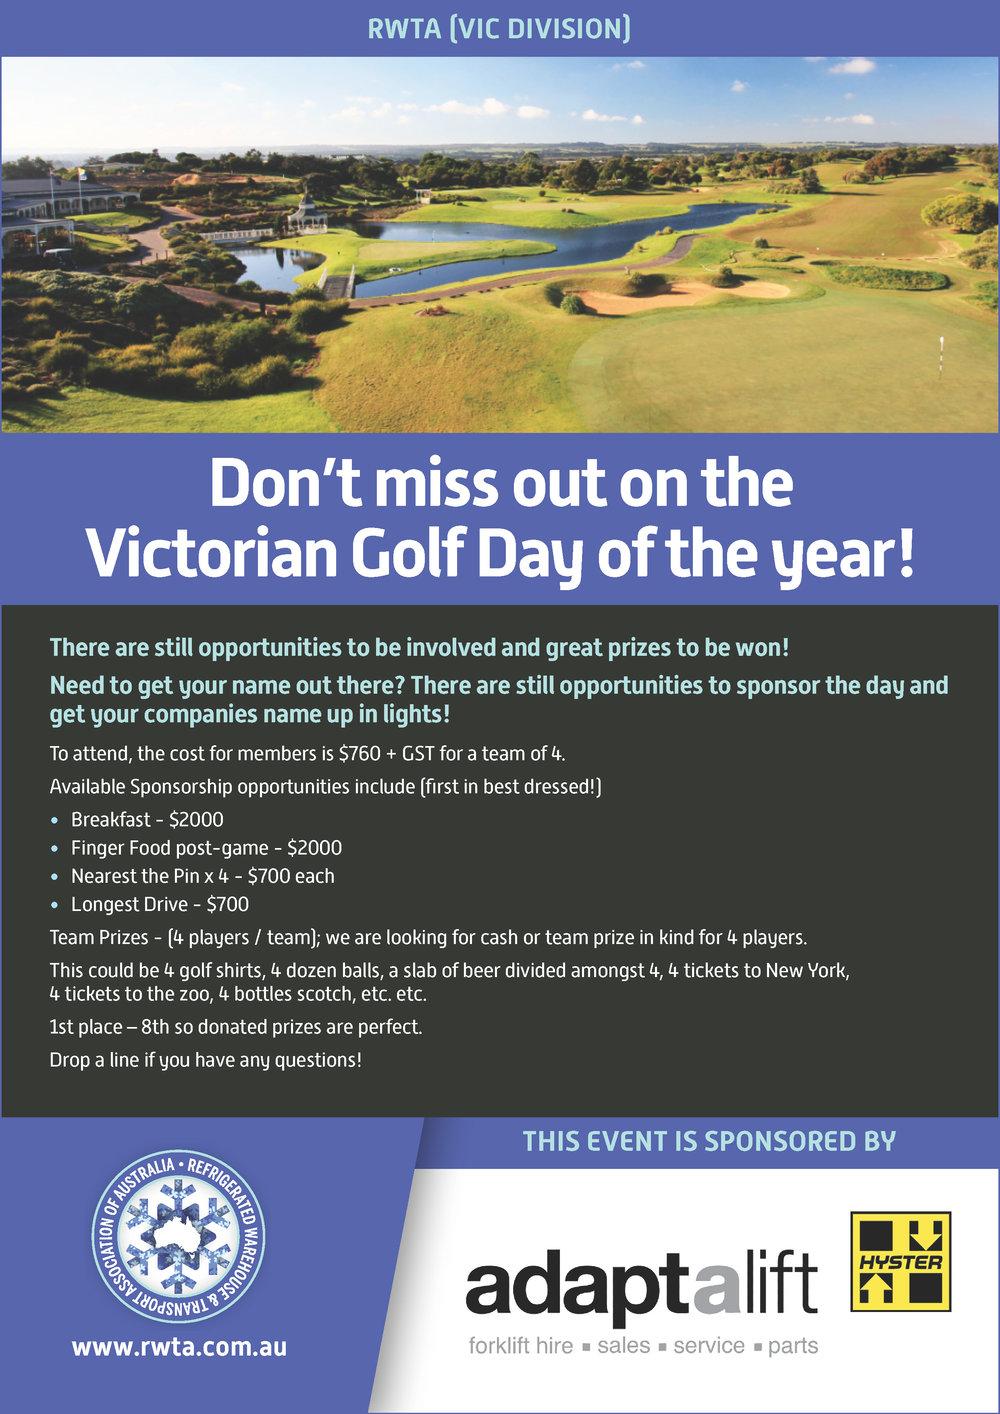 12253_RWTA_VIC Golf Day_Dont miss out_V1-1.jpg